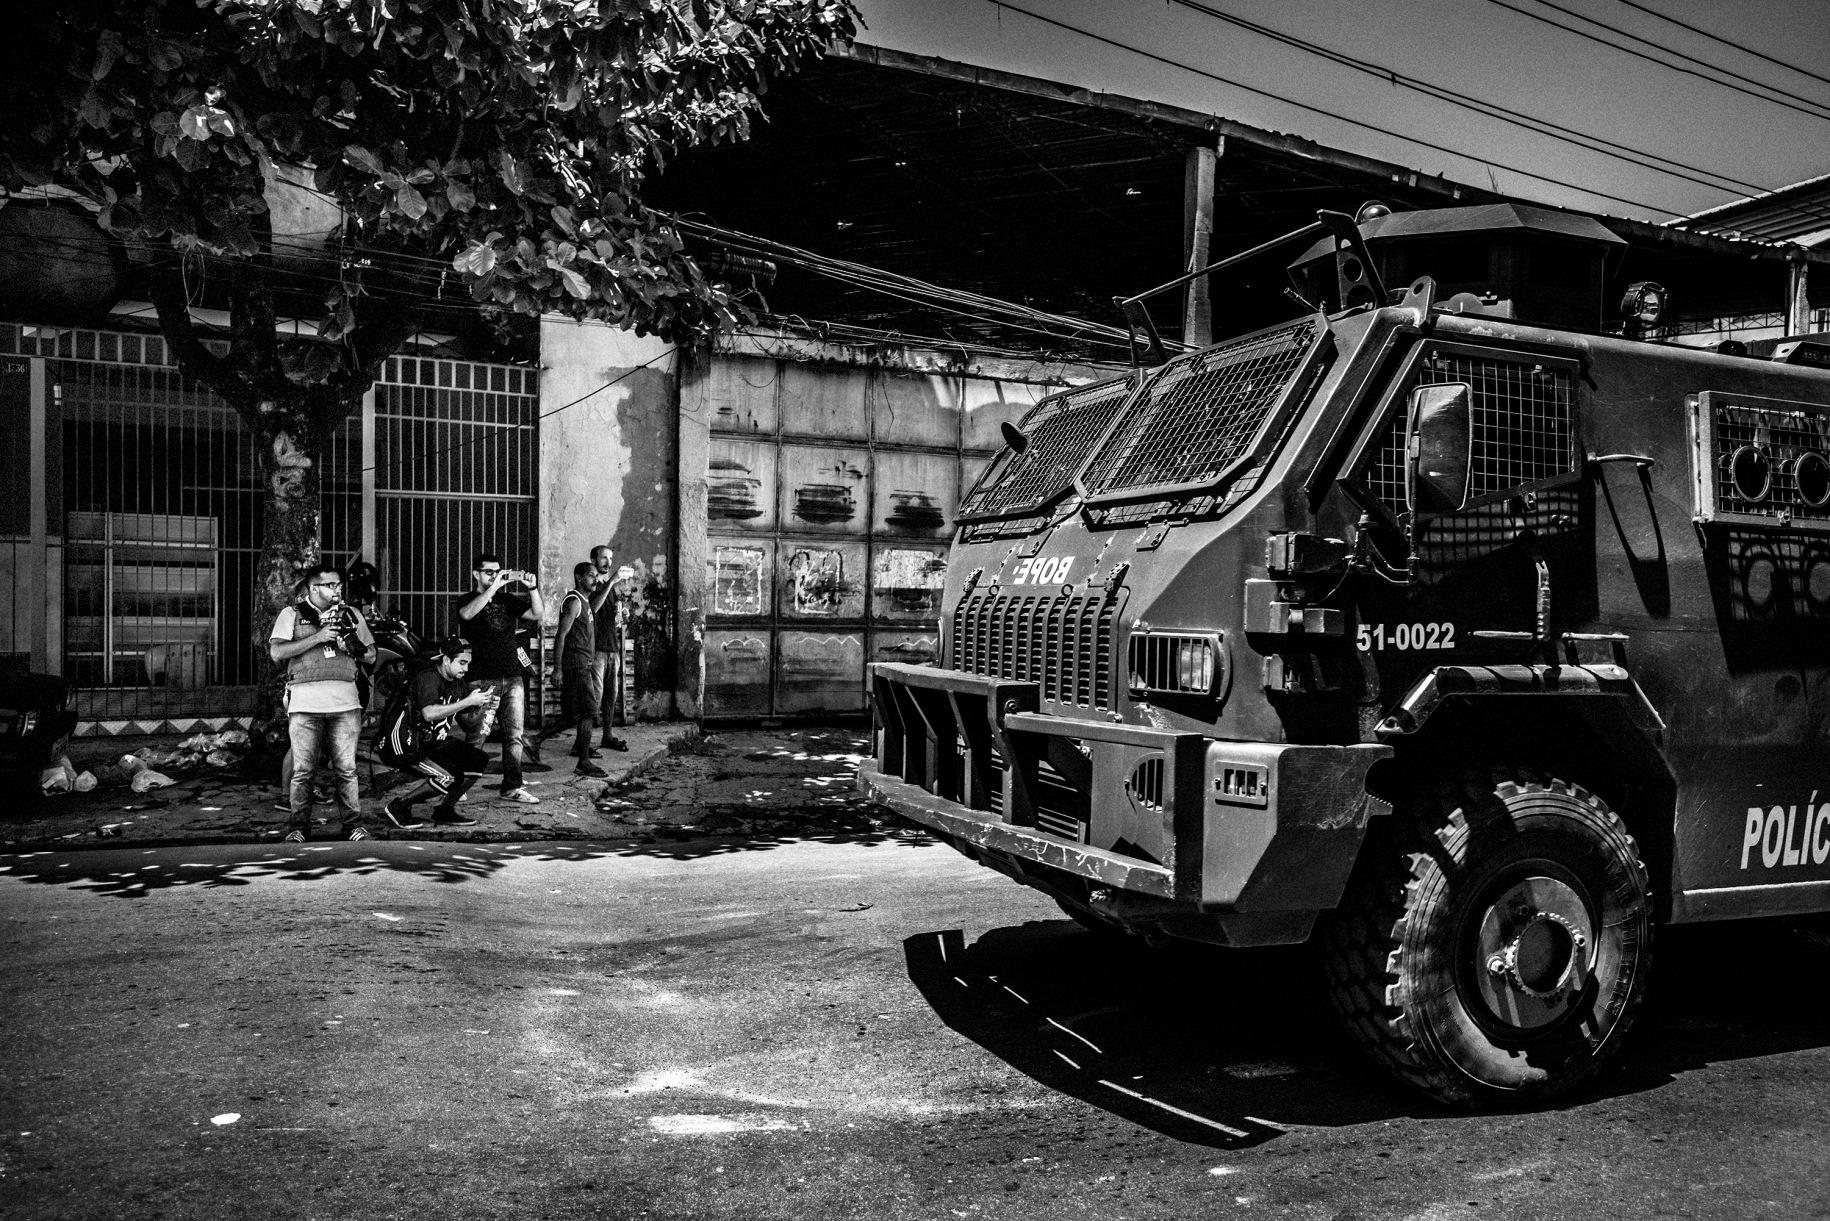 Members of a Brazilian citizen journalism collective document police activity in a Rio de Janeiro favela. Sebastián Liste, Spain, 2015, Noor.